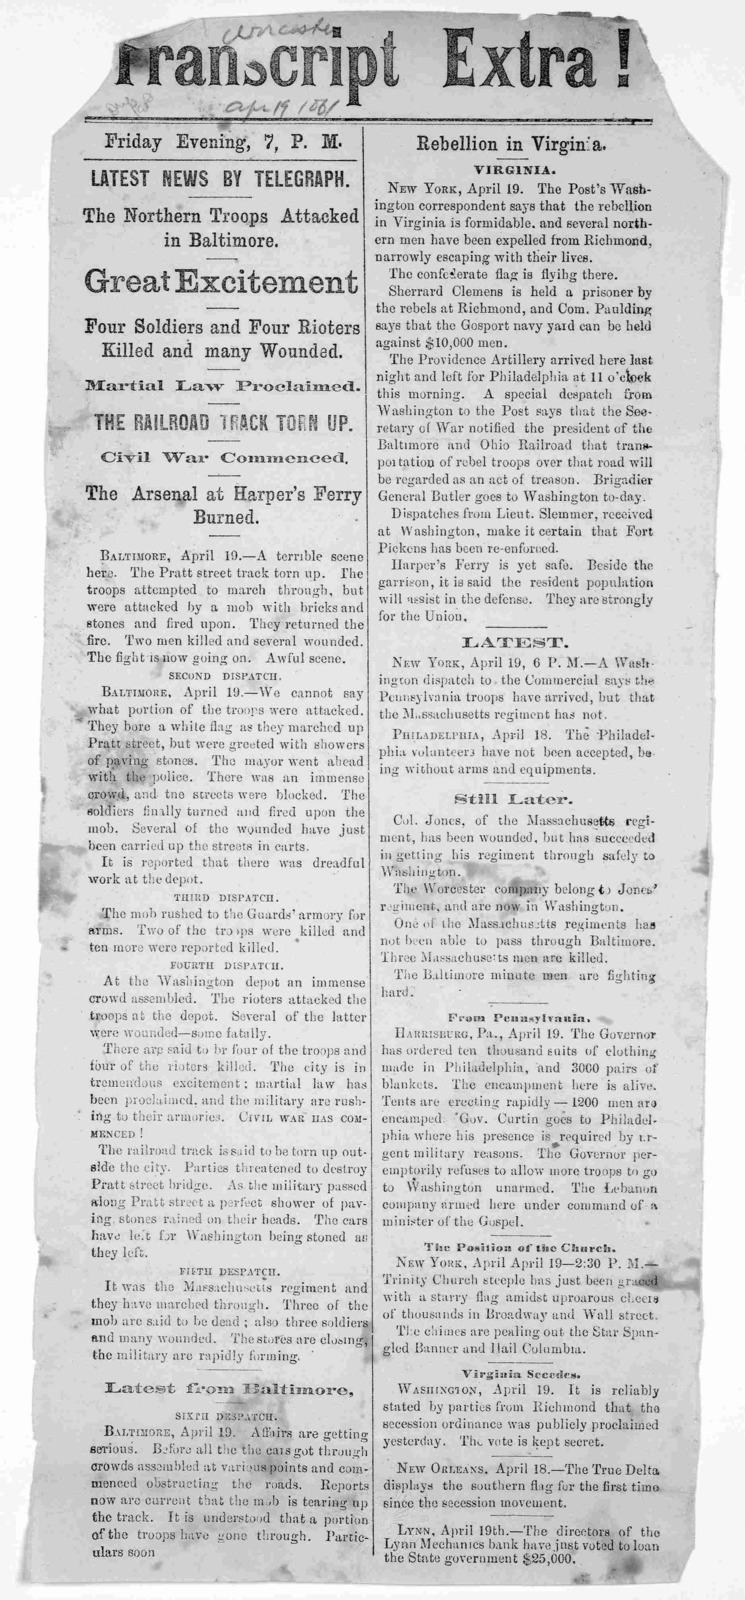 Transcript extra! [April 19, 1861] Friday evening 7 P. M.